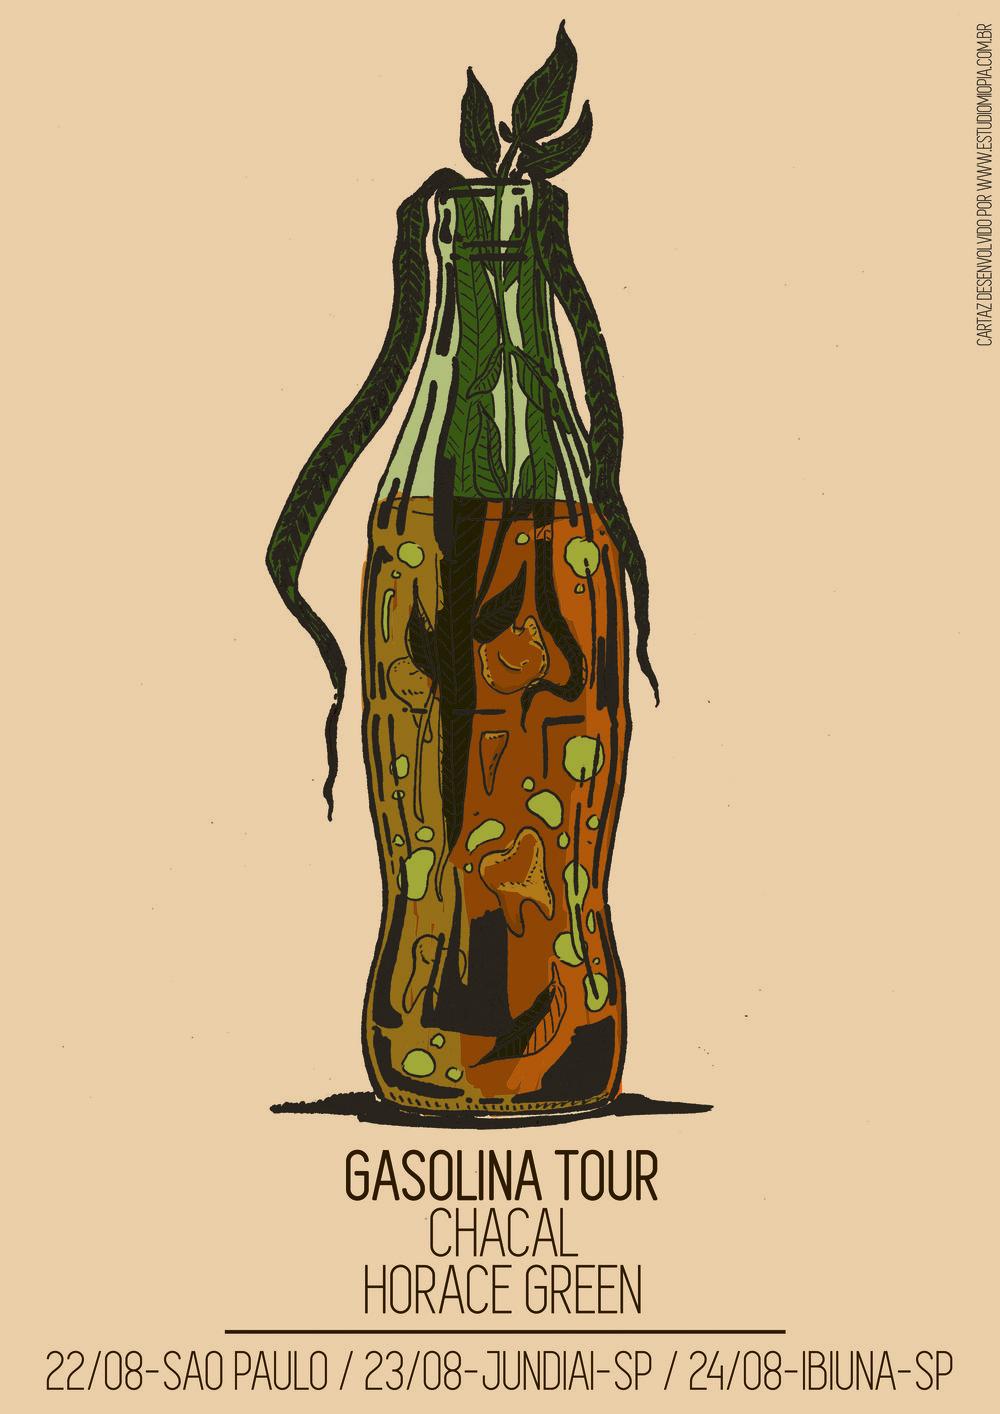 gasolinatour_geral.jpg